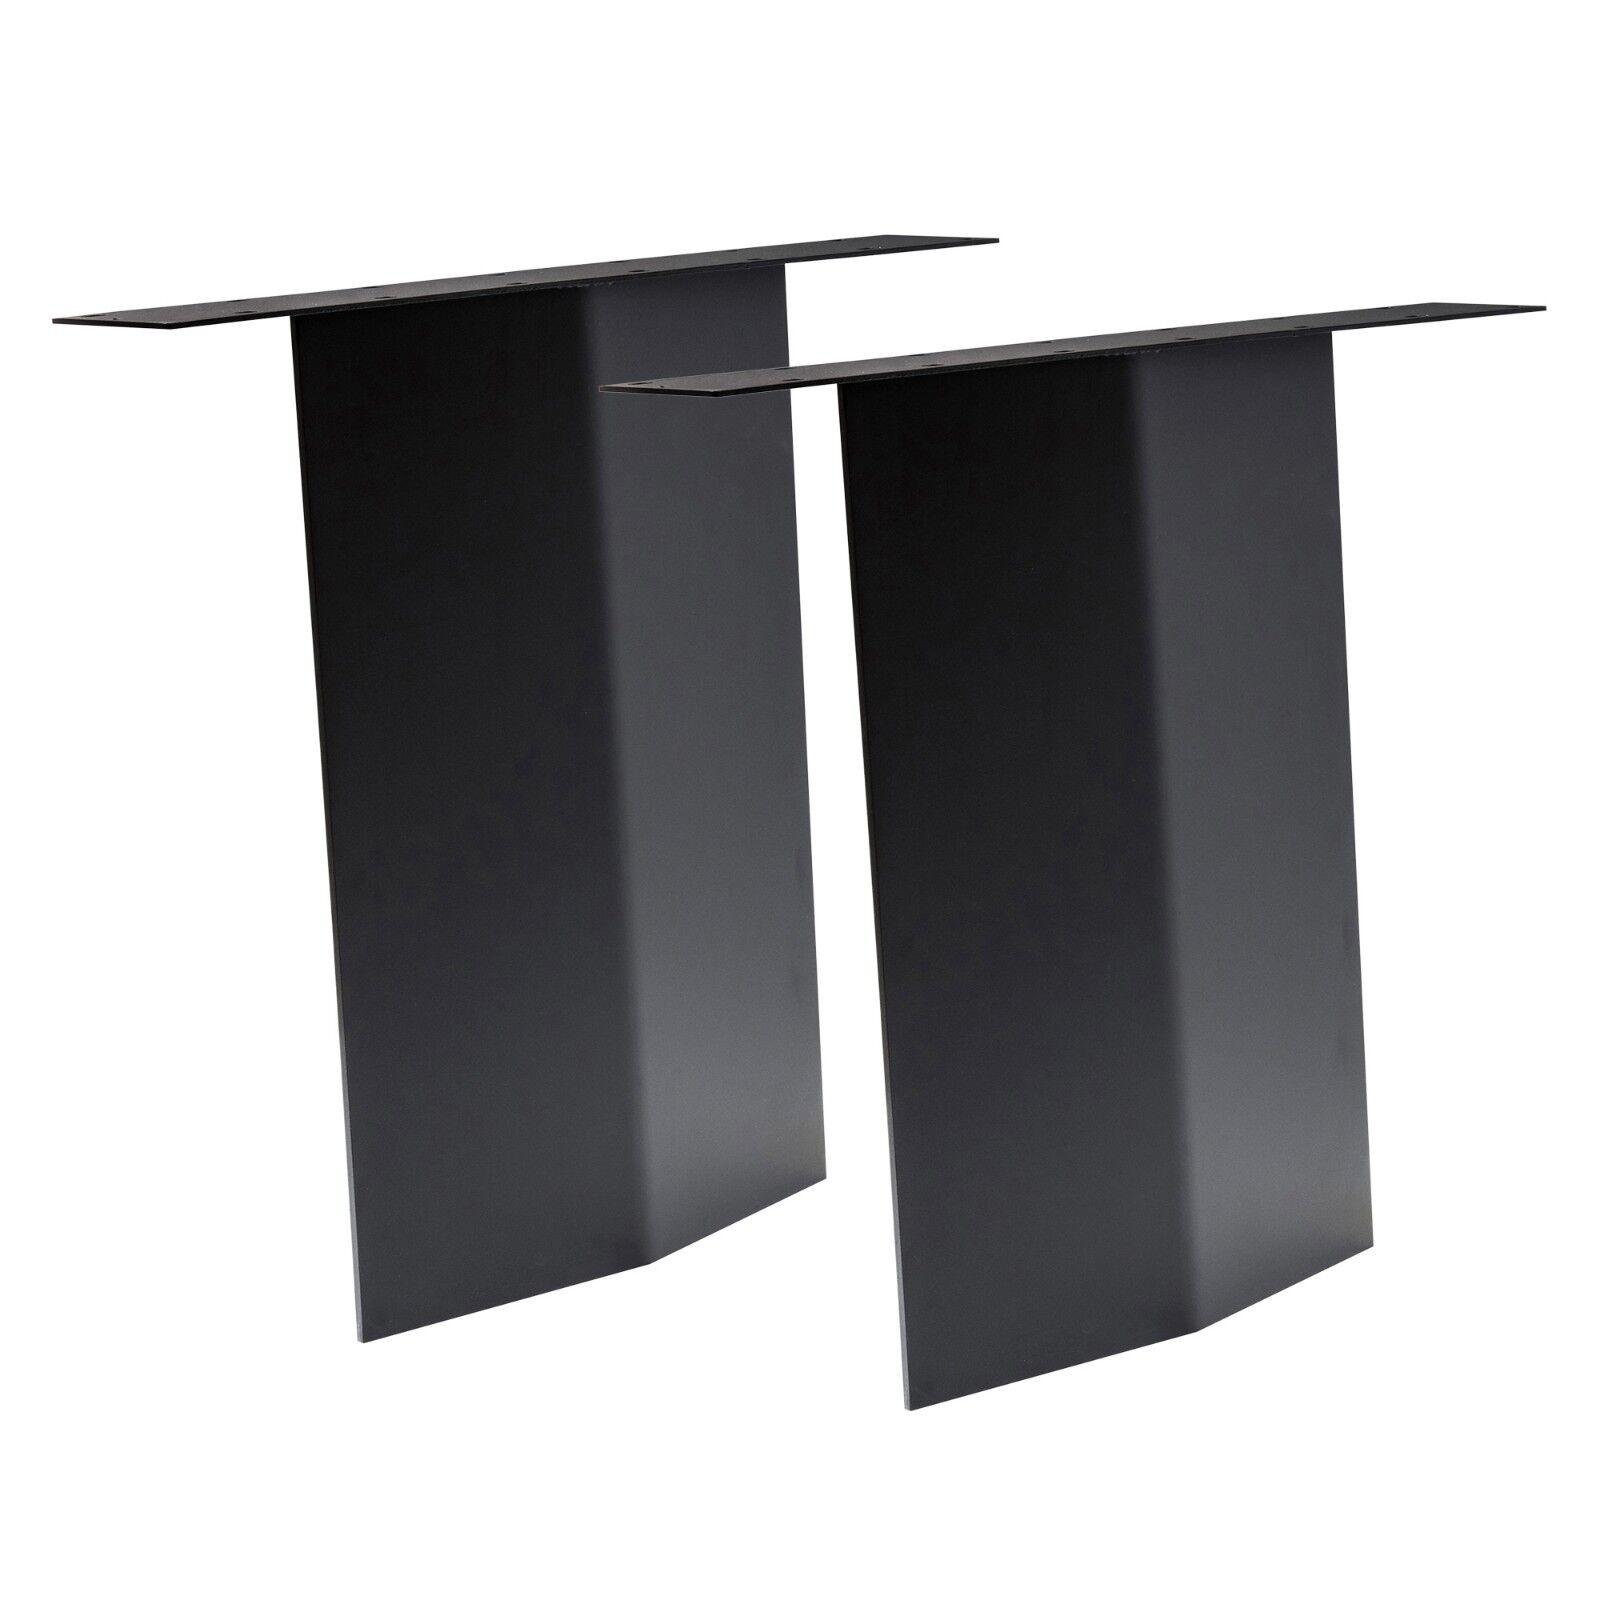 Tischgestell WUV 105 V-Wange schwarz Design V-Form Stahlwange Tischkufe Esstisch